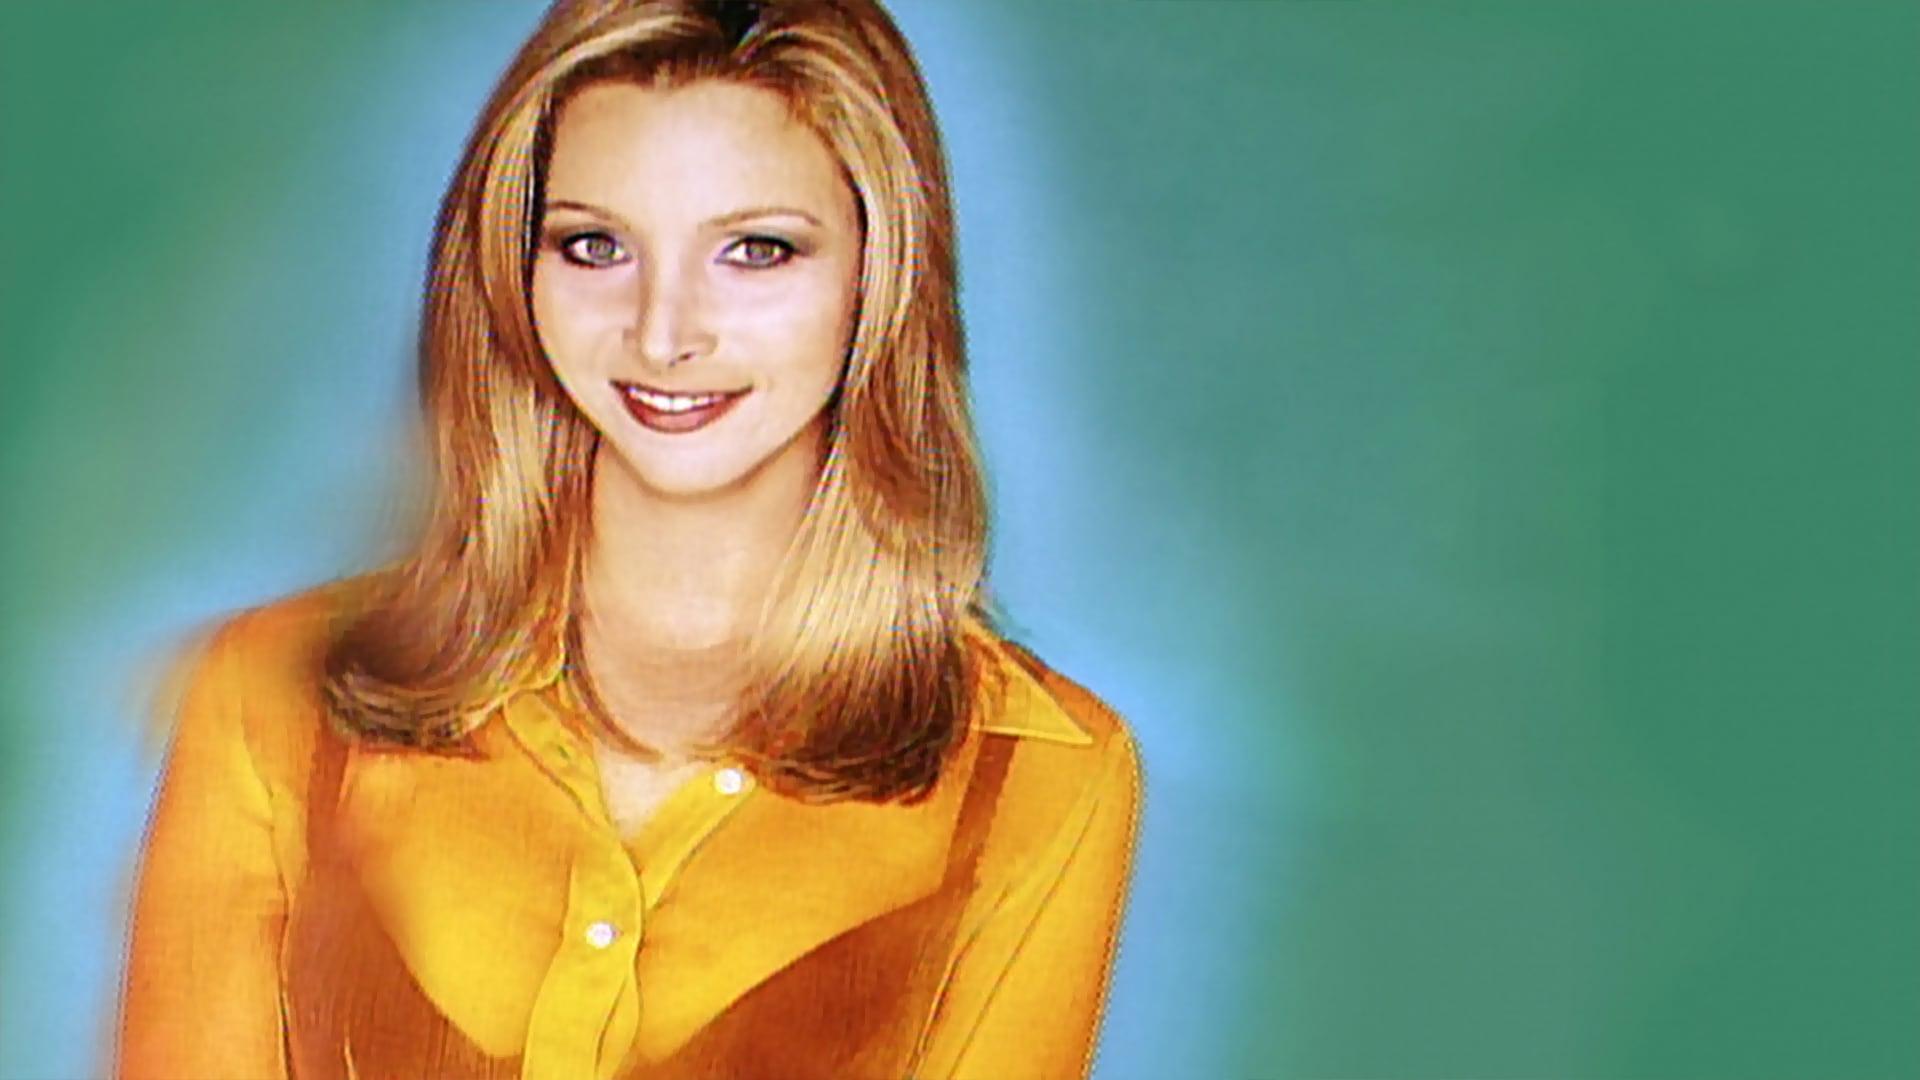 Lisa Kudrow: October 5, 1996